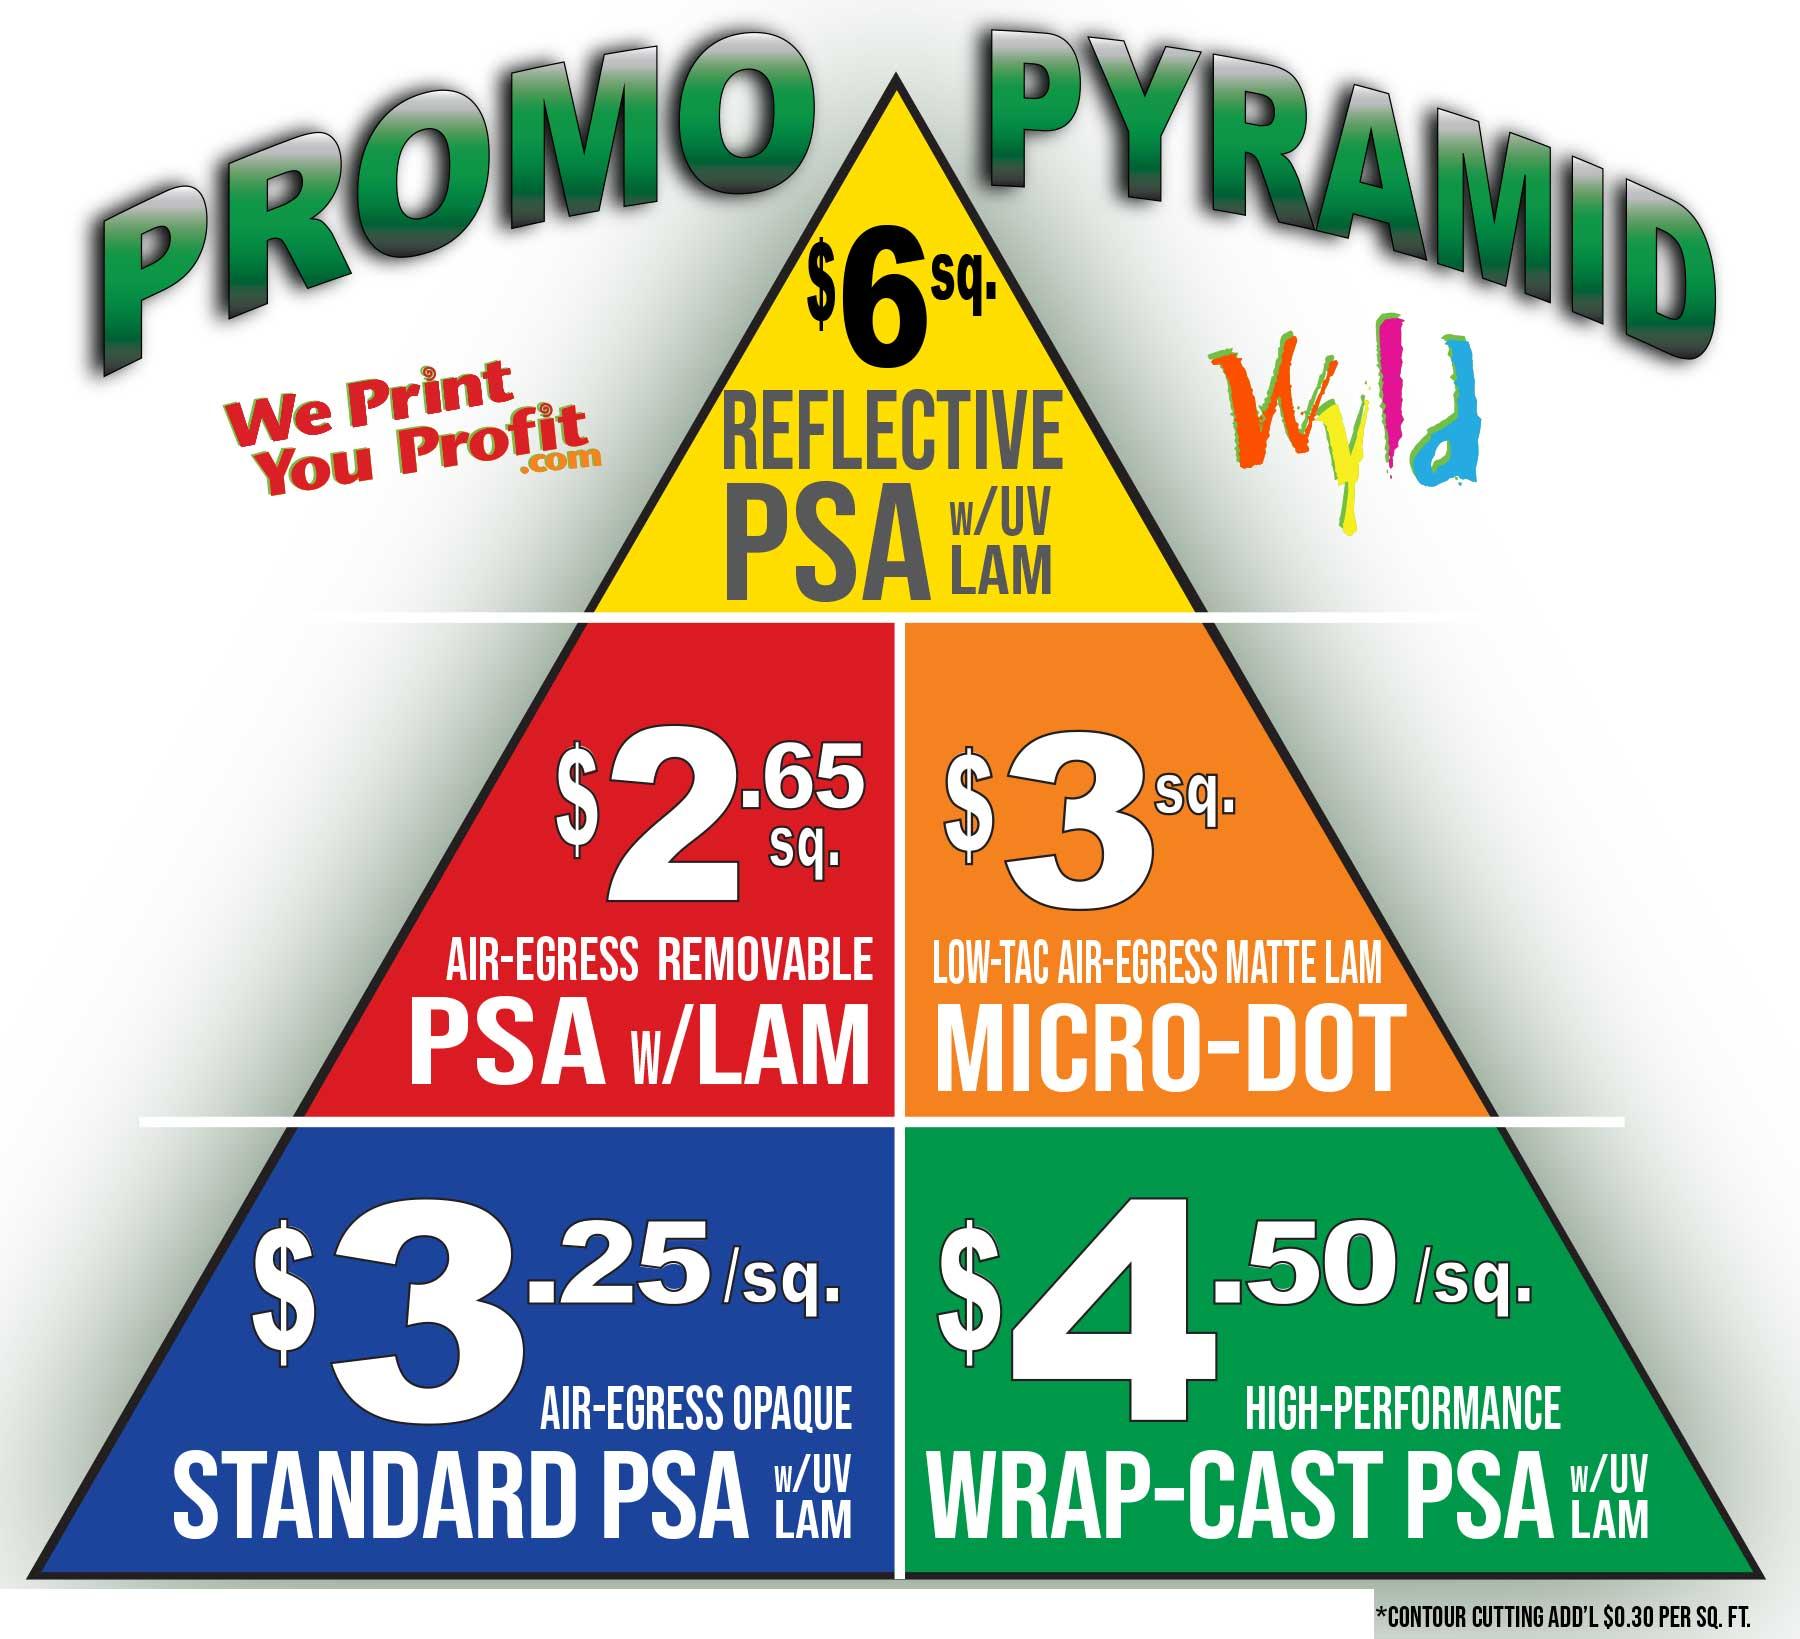 Promo Pyramid